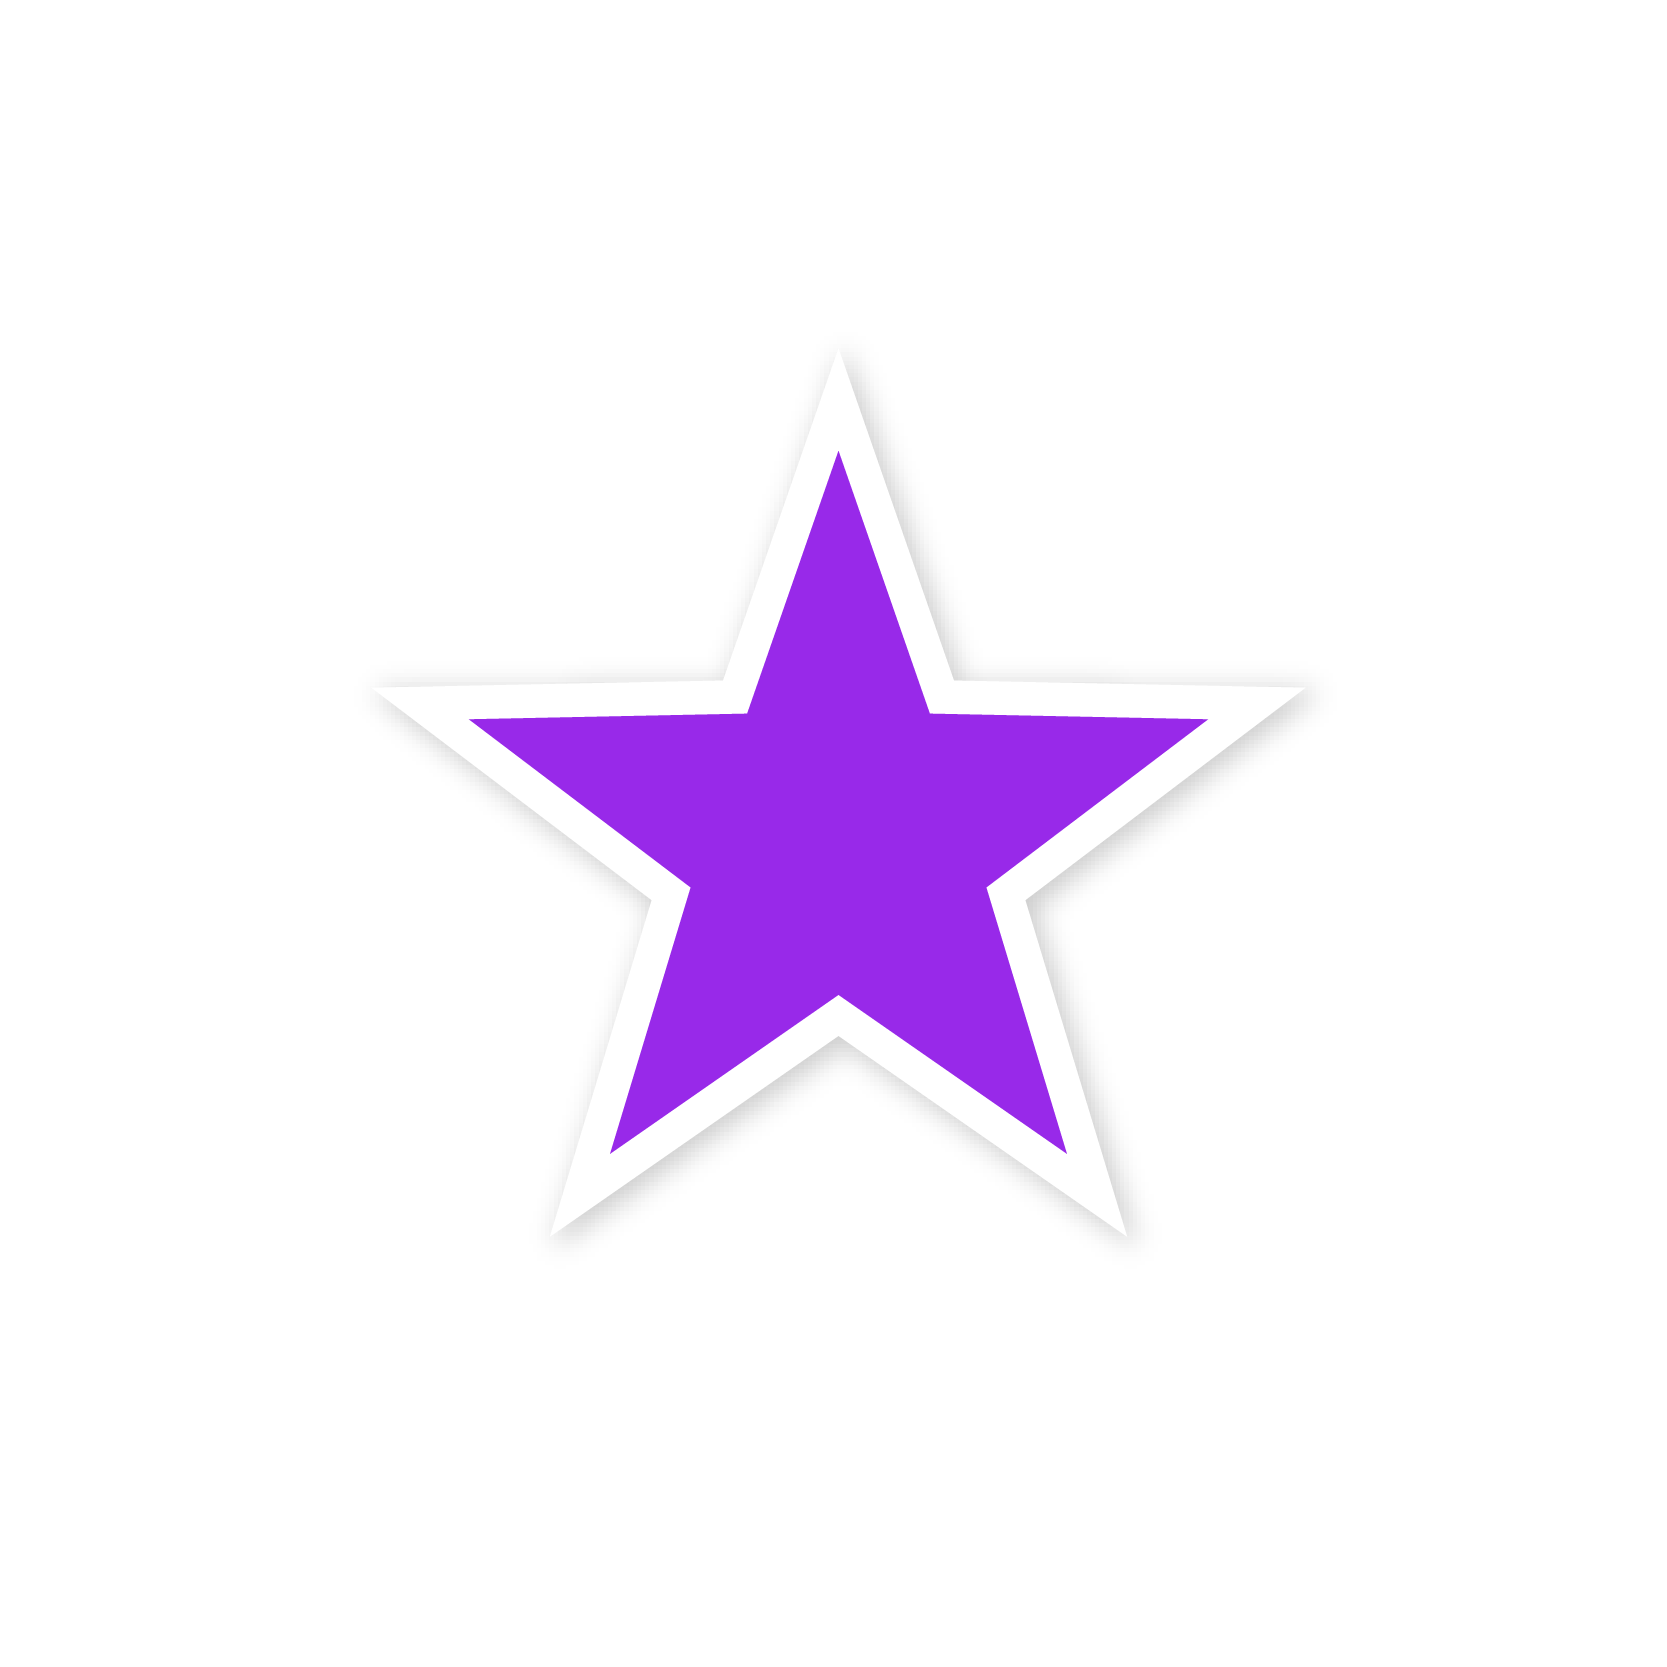 A violet star sticker